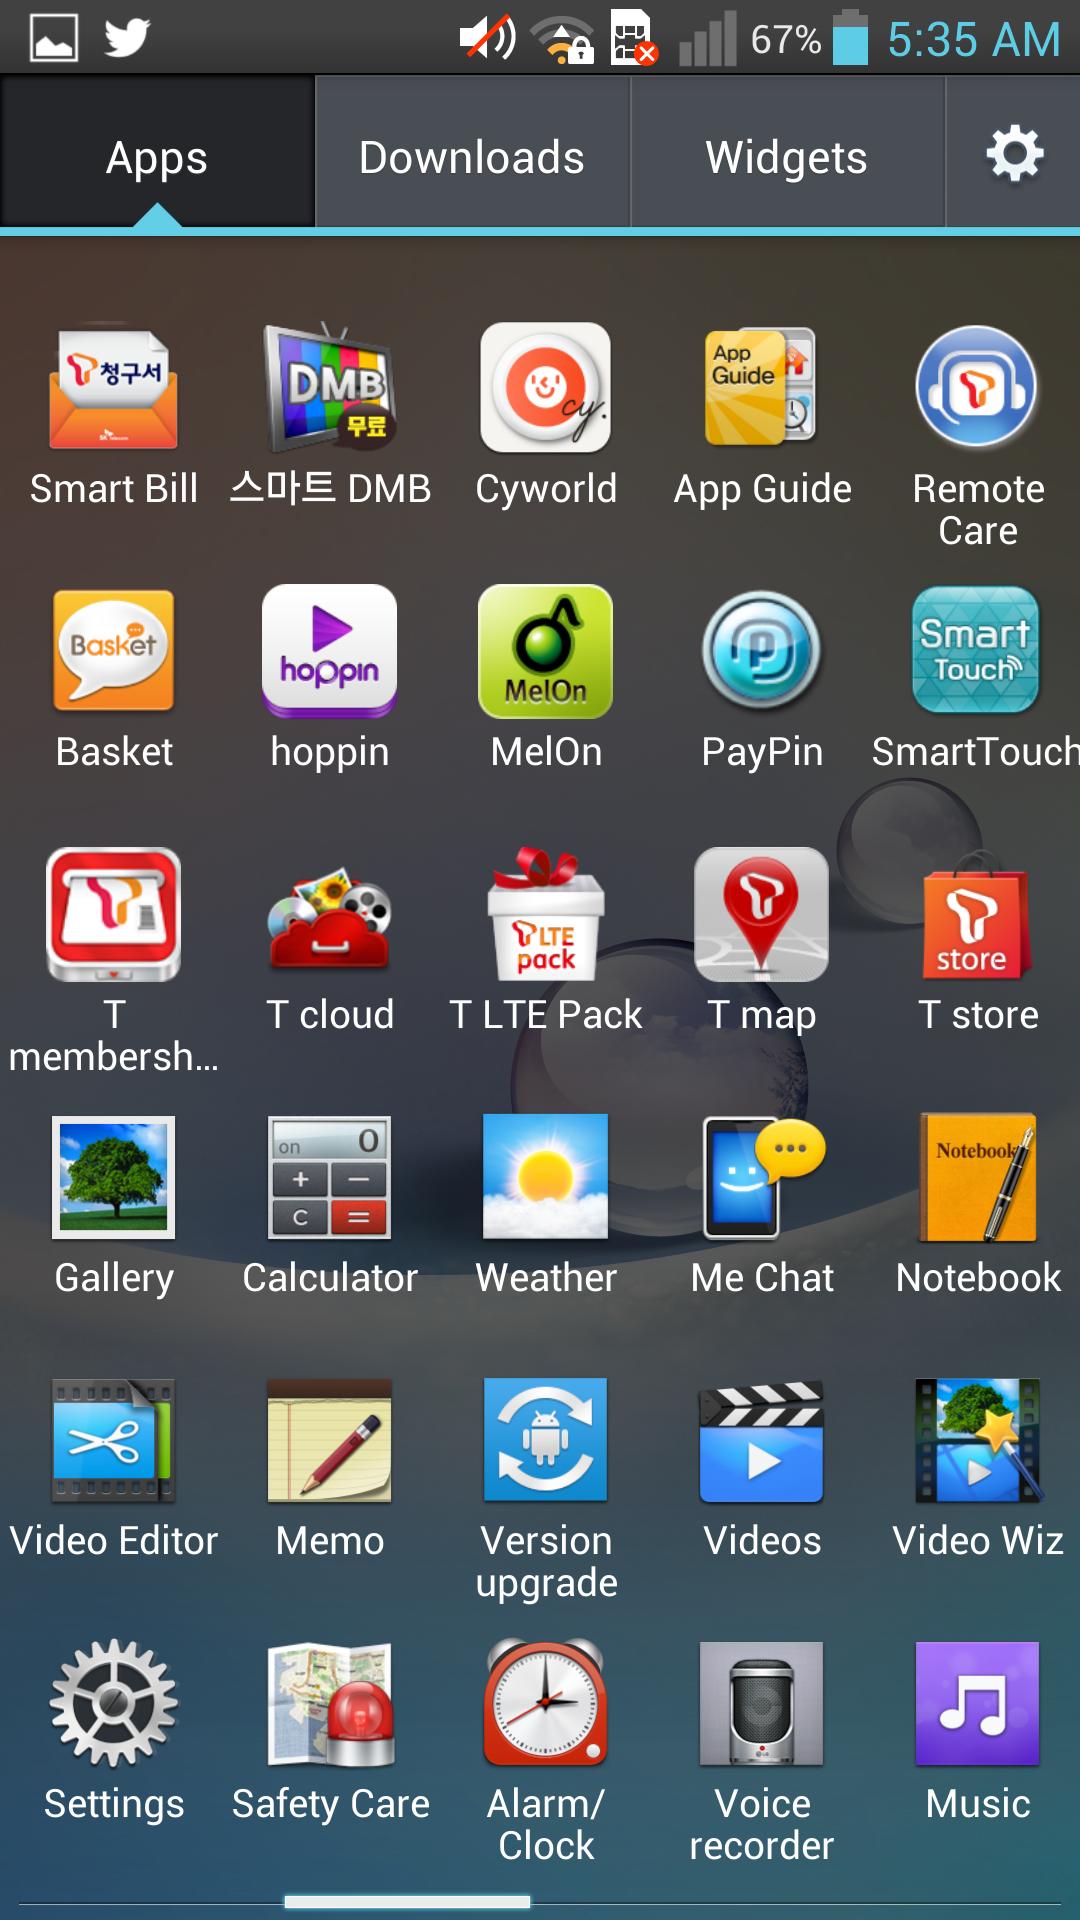 Apps, apps, apps, apps, apps, apps—everybody!